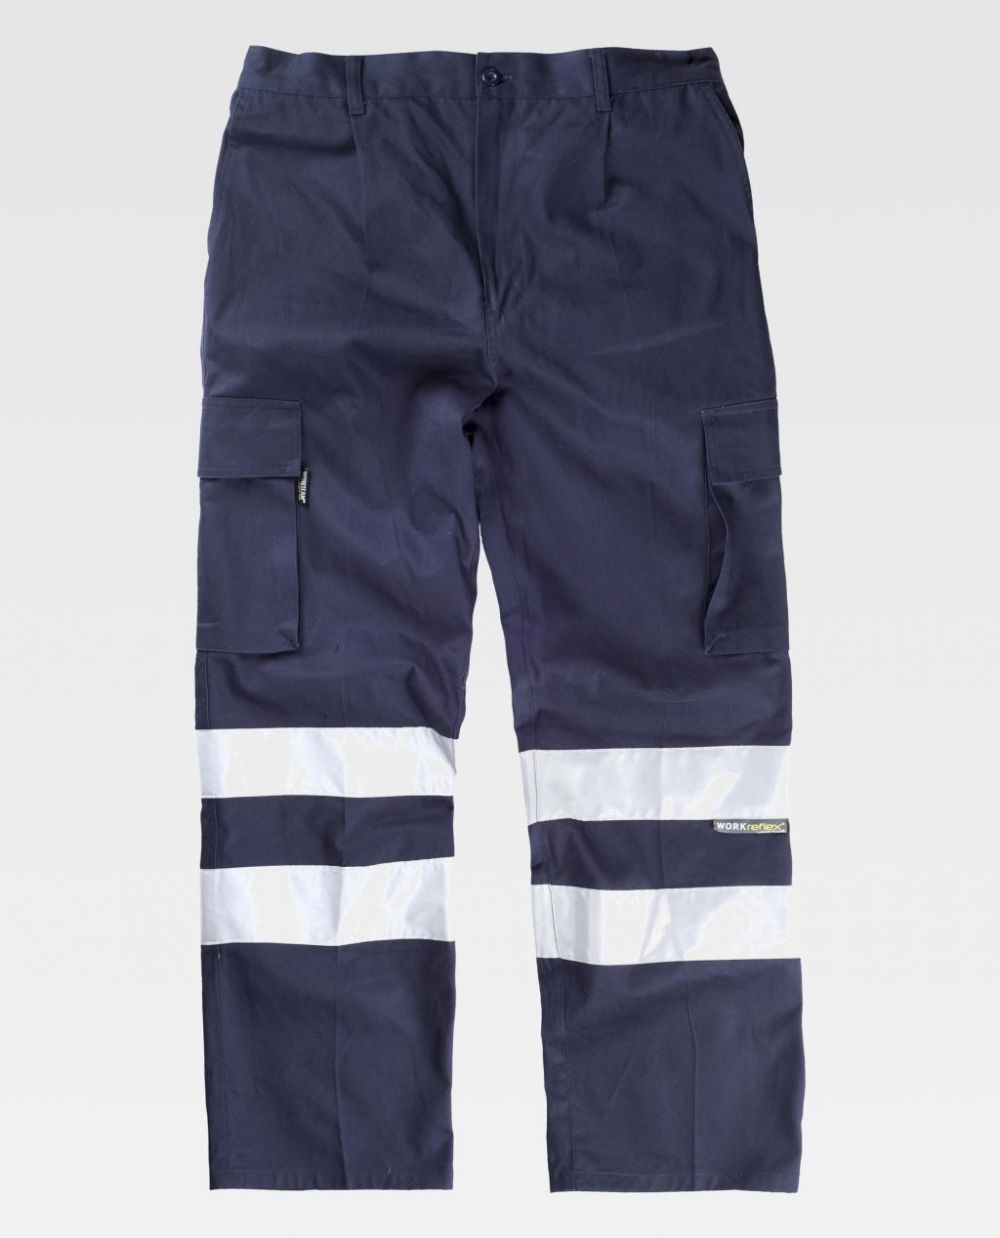 Pantalones reflectantes workteam recto algodon de 100% algodón vista 1